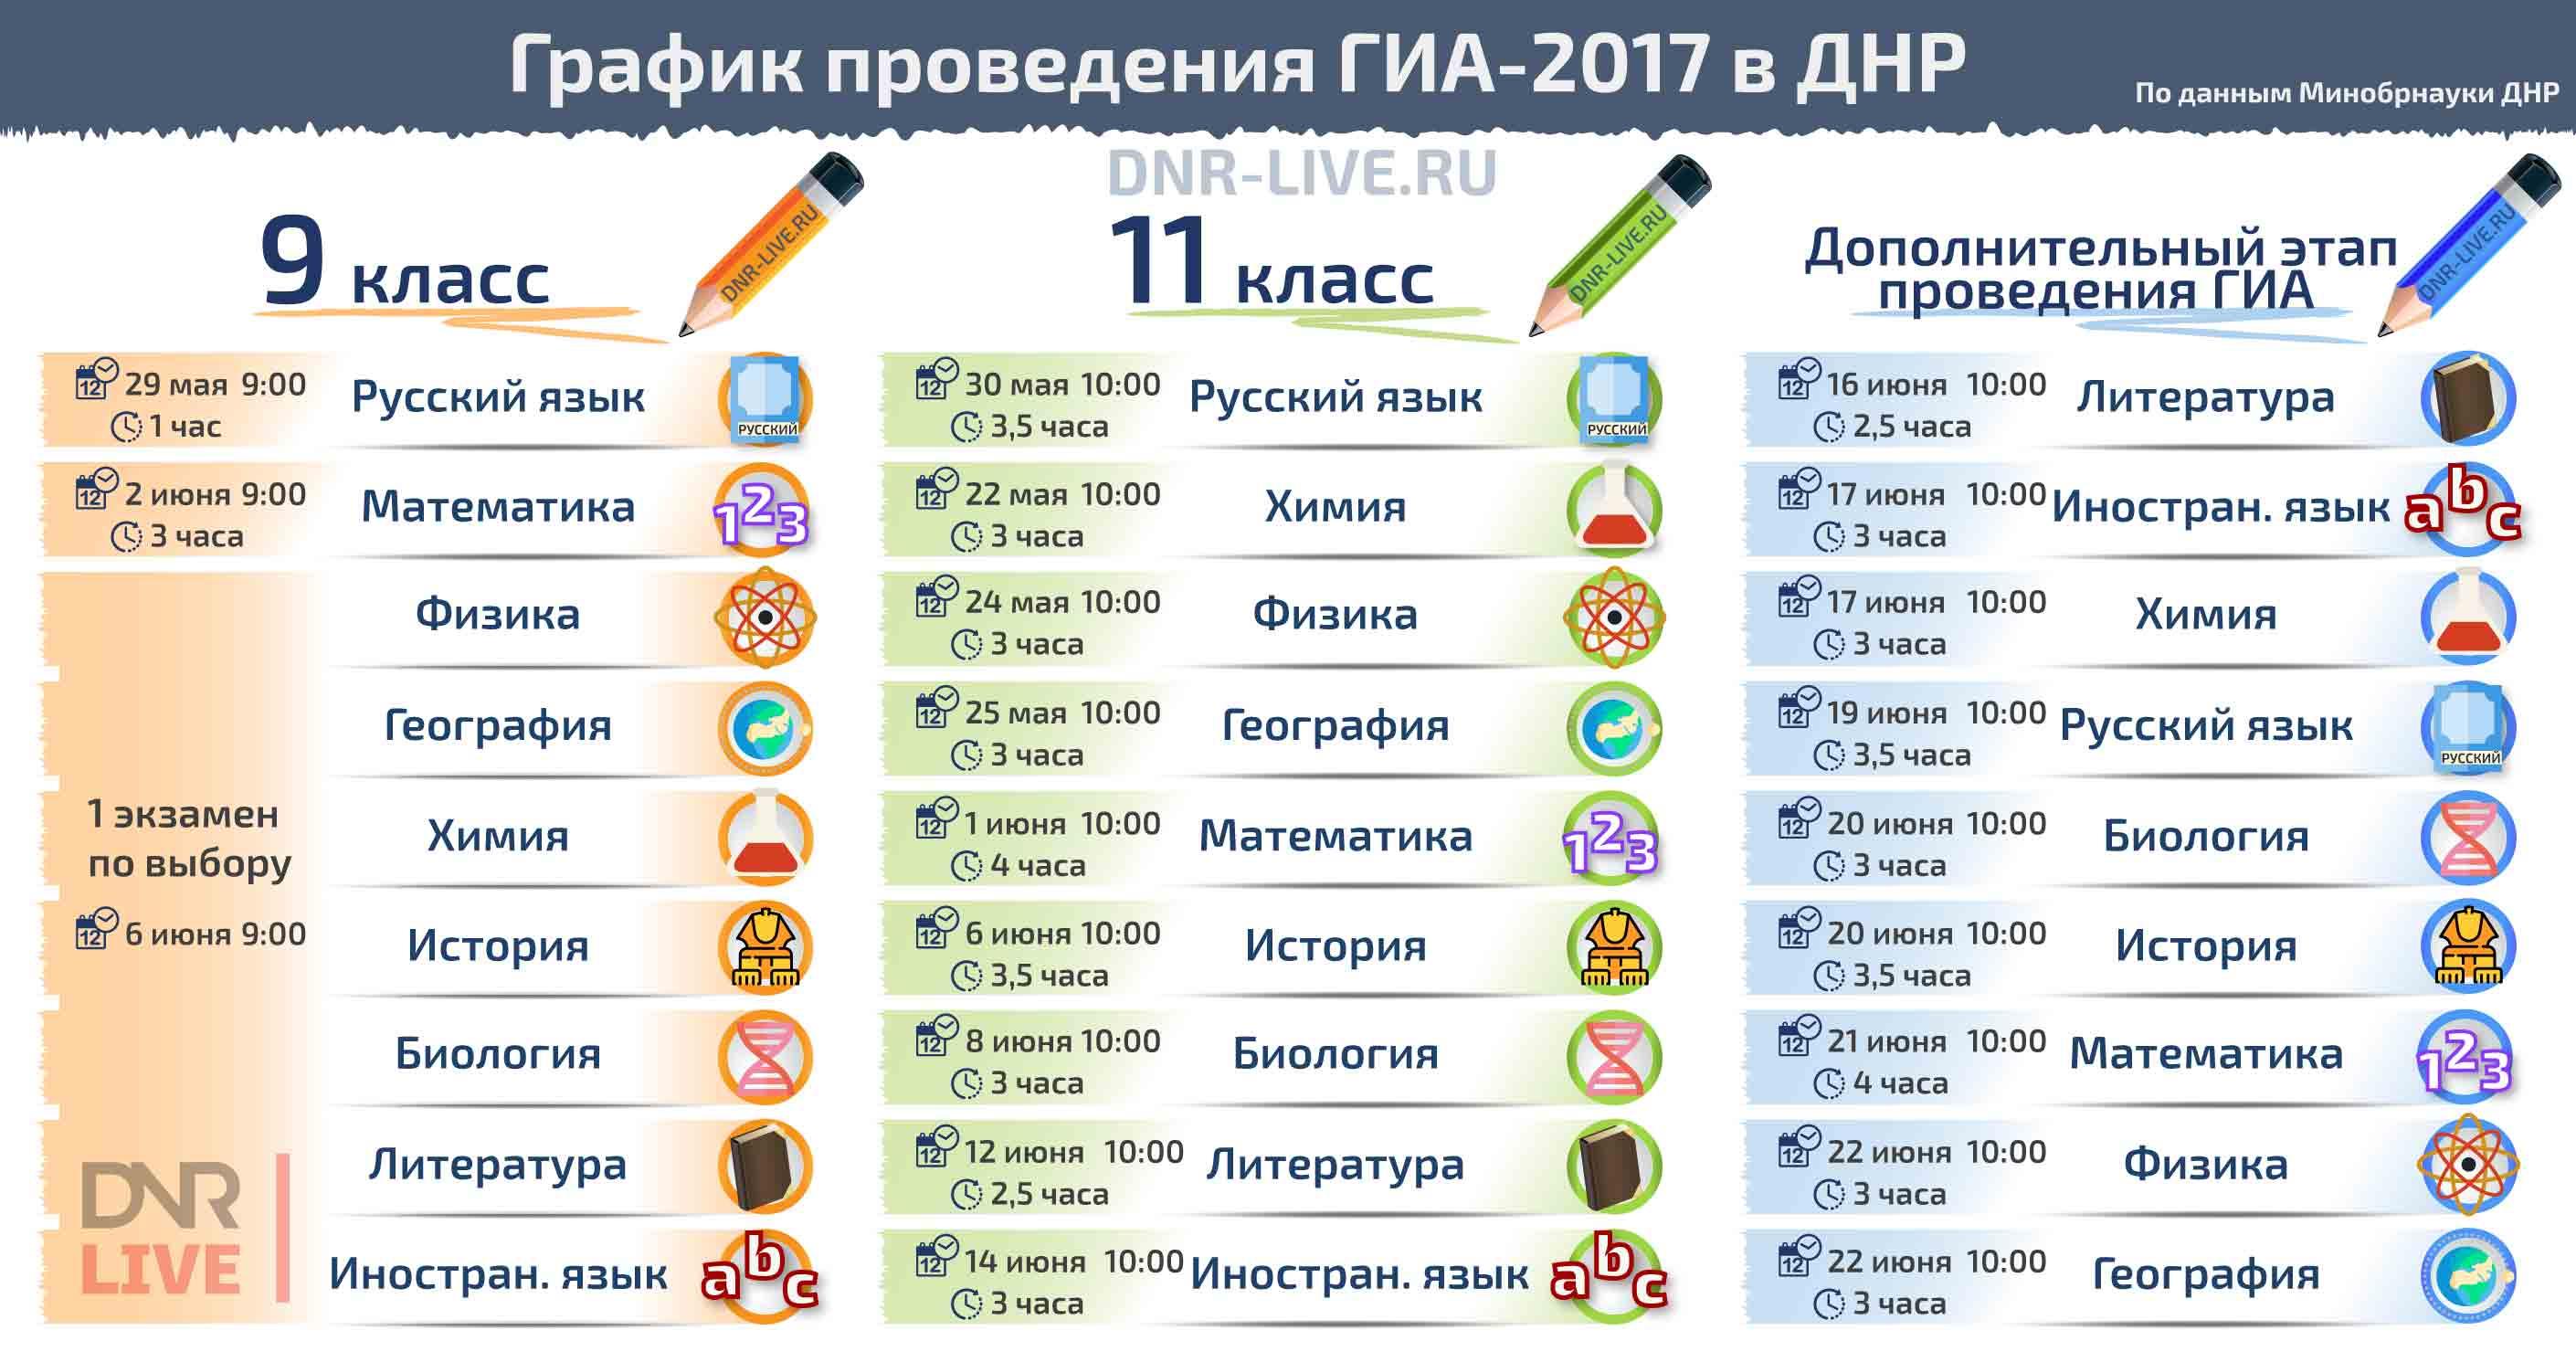 График-проведения-ГИА-2017-в-ДНР